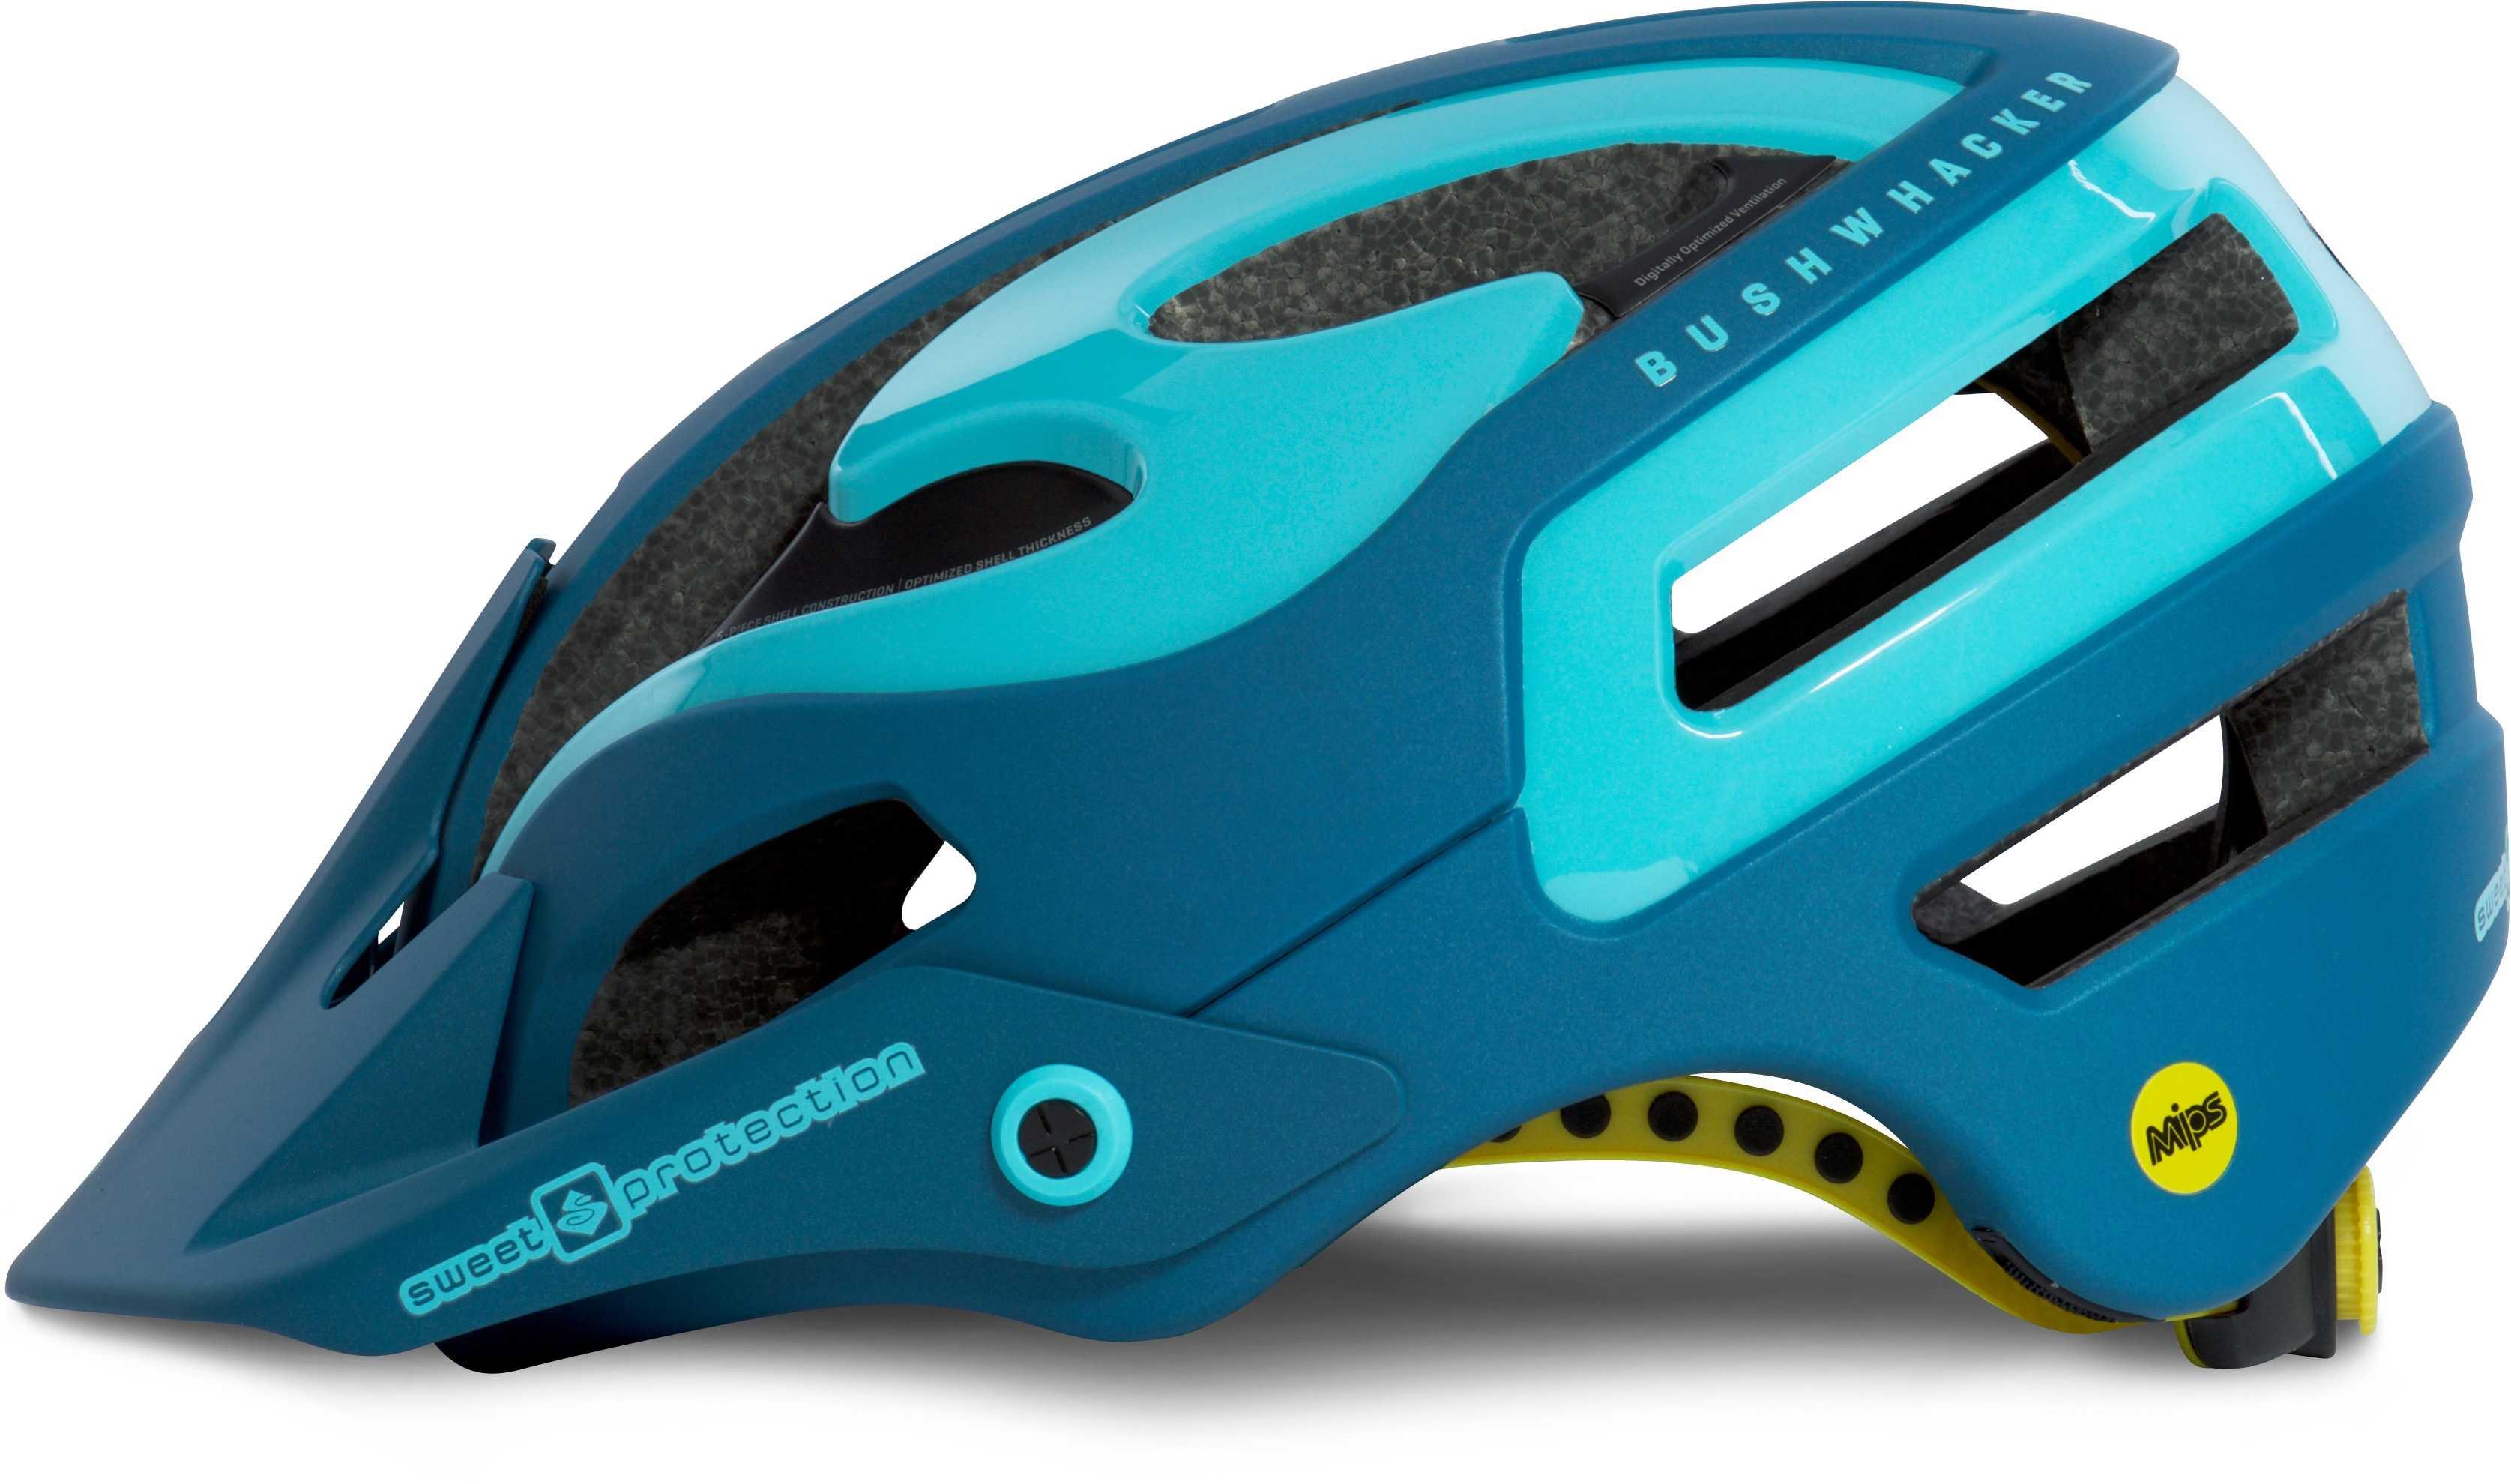 Hjälm Sweet Protection Bushwhacker II MIPS dam mörkblå/isblå metallic 56-59 cm